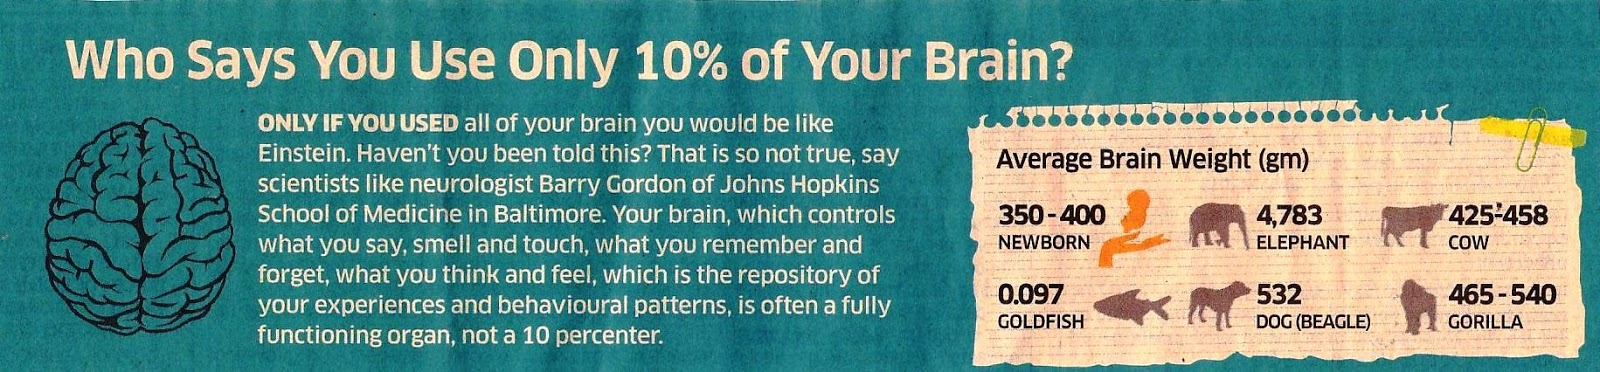 Thane Jain Yuva Group: Do we really use 10% of brain?